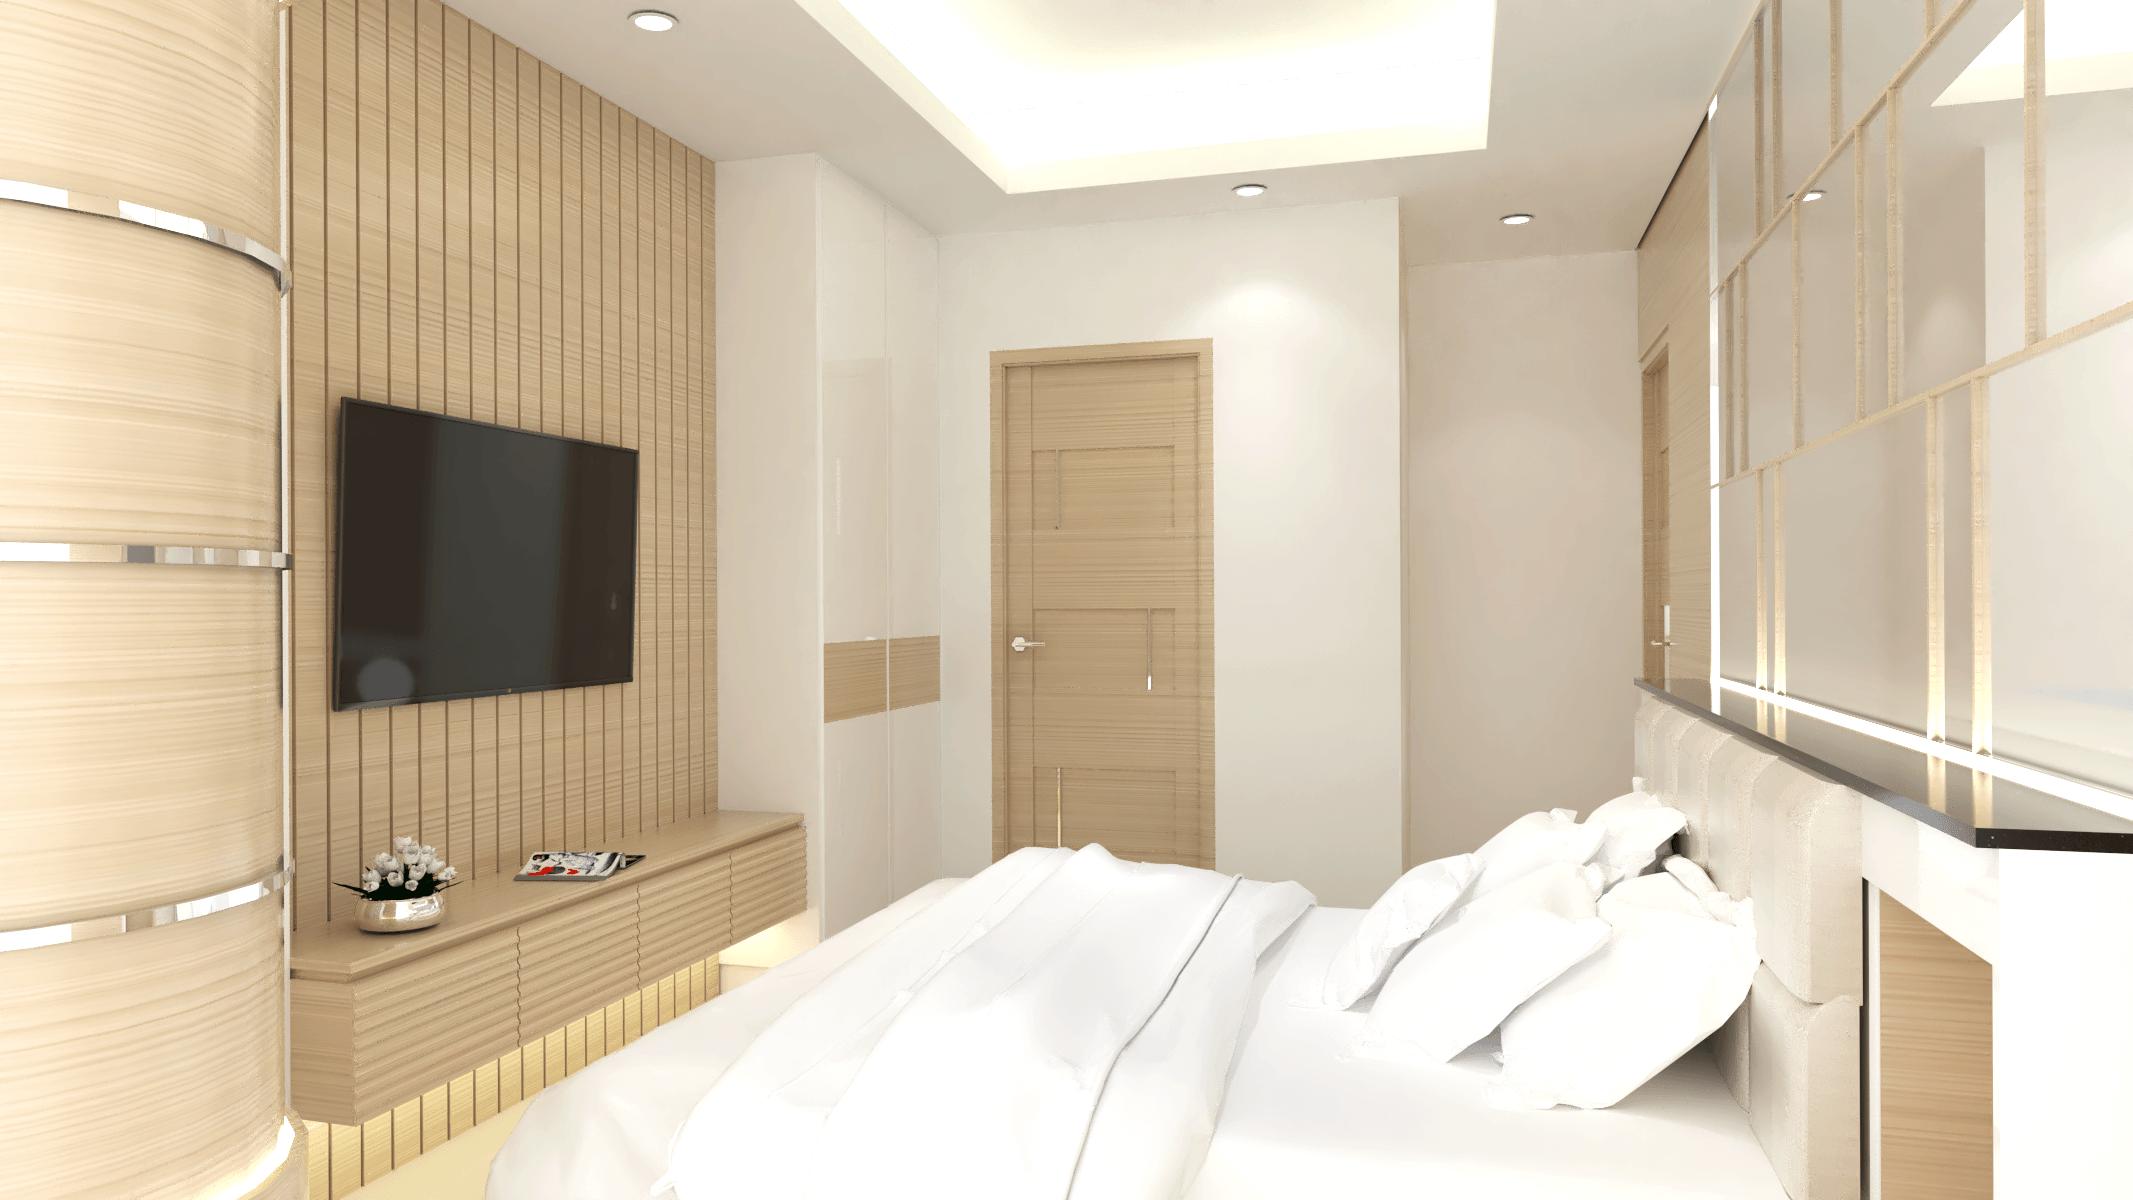 Dwp Studio Interior Apartement Gold Coast Pik 8, Rt.8/rw.1, Kamal Muara, Kec. Penjaringan, Kota Jkt Utara, Daerah Khusus Ibukota Jakarta 14470, Indonesia 8, Rt.8/rw.1, Kamal Muara, Kec. Penjaringan, Kota Jkt Utara, Daerah Khusus Ibukota Jakarta 14470, Indonesia Dwi-Windyas-Putri-Interior-Apartement-Gold-Coast-Pik   121587